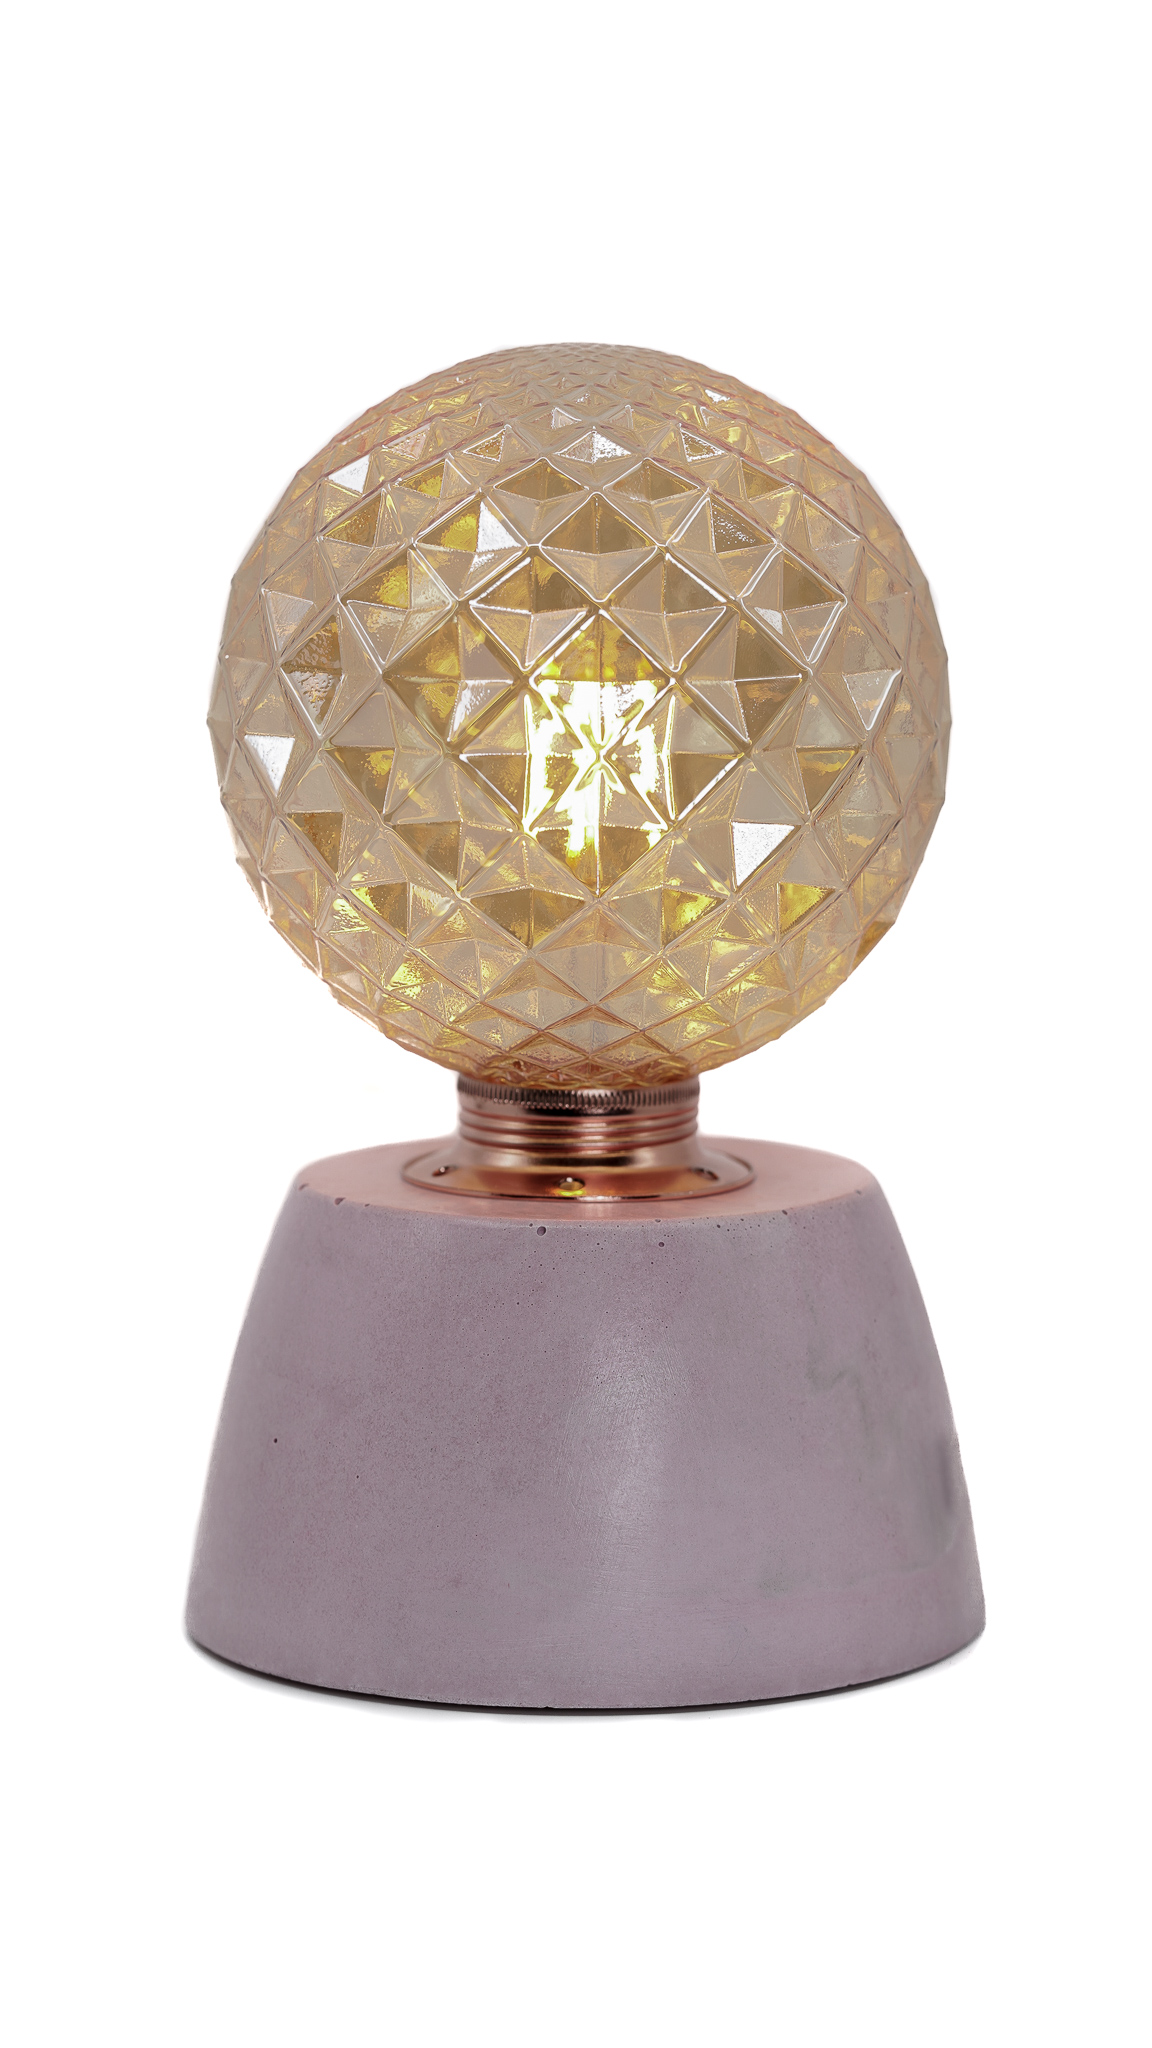 Lampe dôme diamant béton rose fabrication artisanale